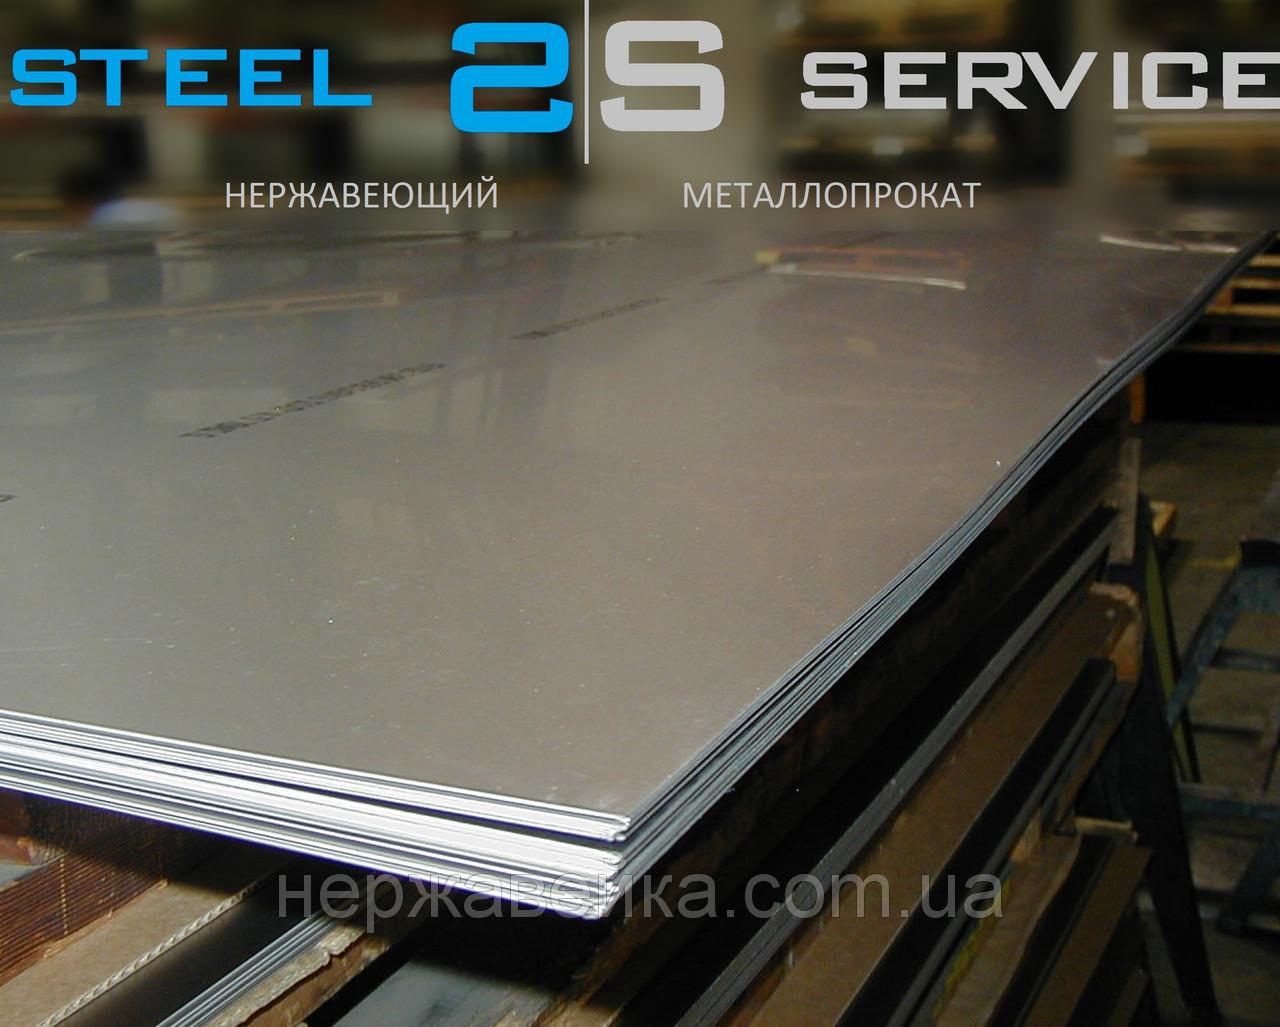 Нержавеющий лист 4х1500х3000мм AISI 430(12Х17) 2B - матовый, технический